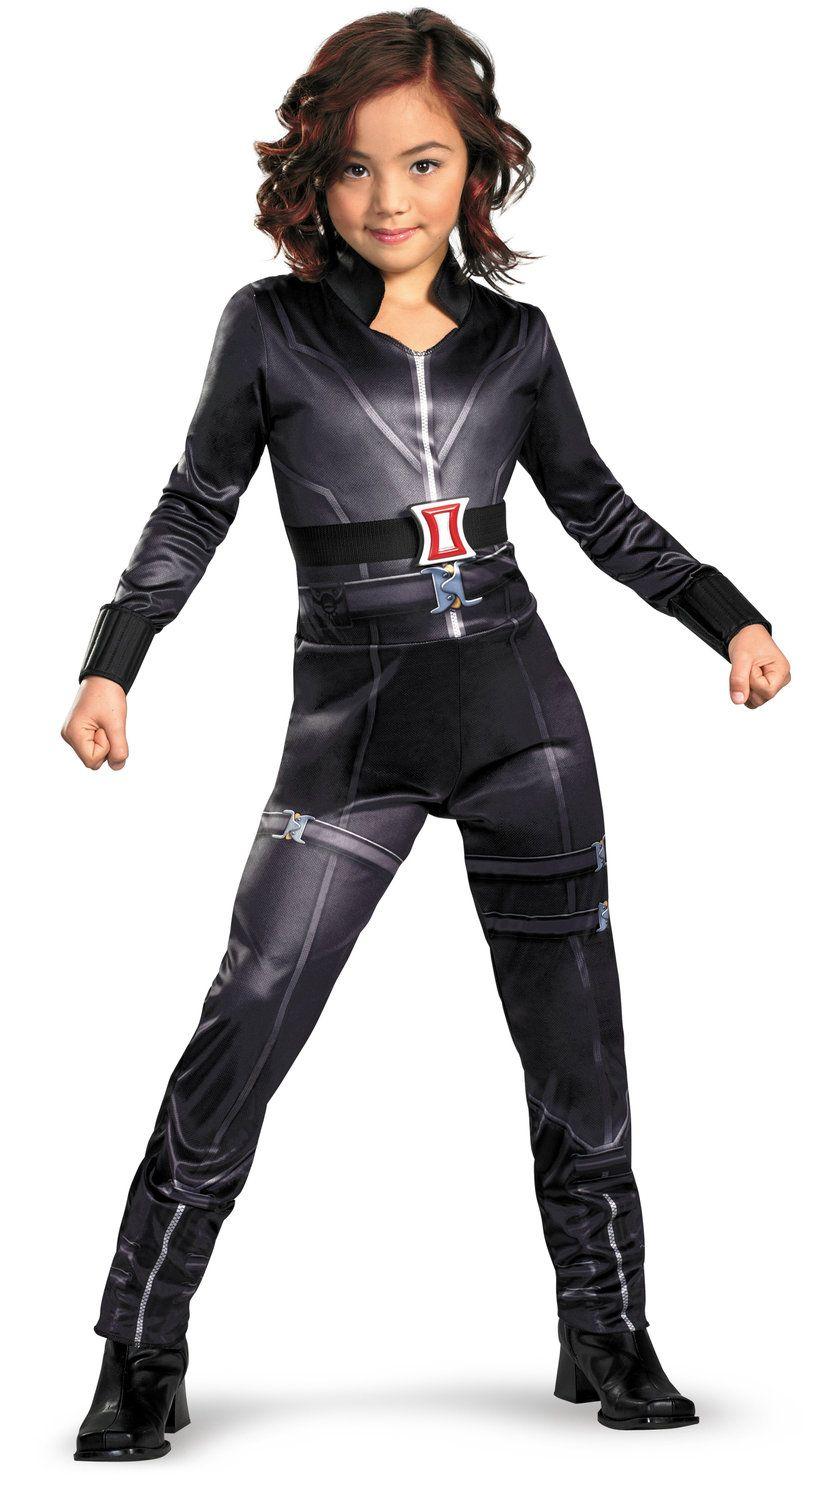 female superhero costumes for kids | girls black widow avengers movie kids costume kids superhero costumes ...